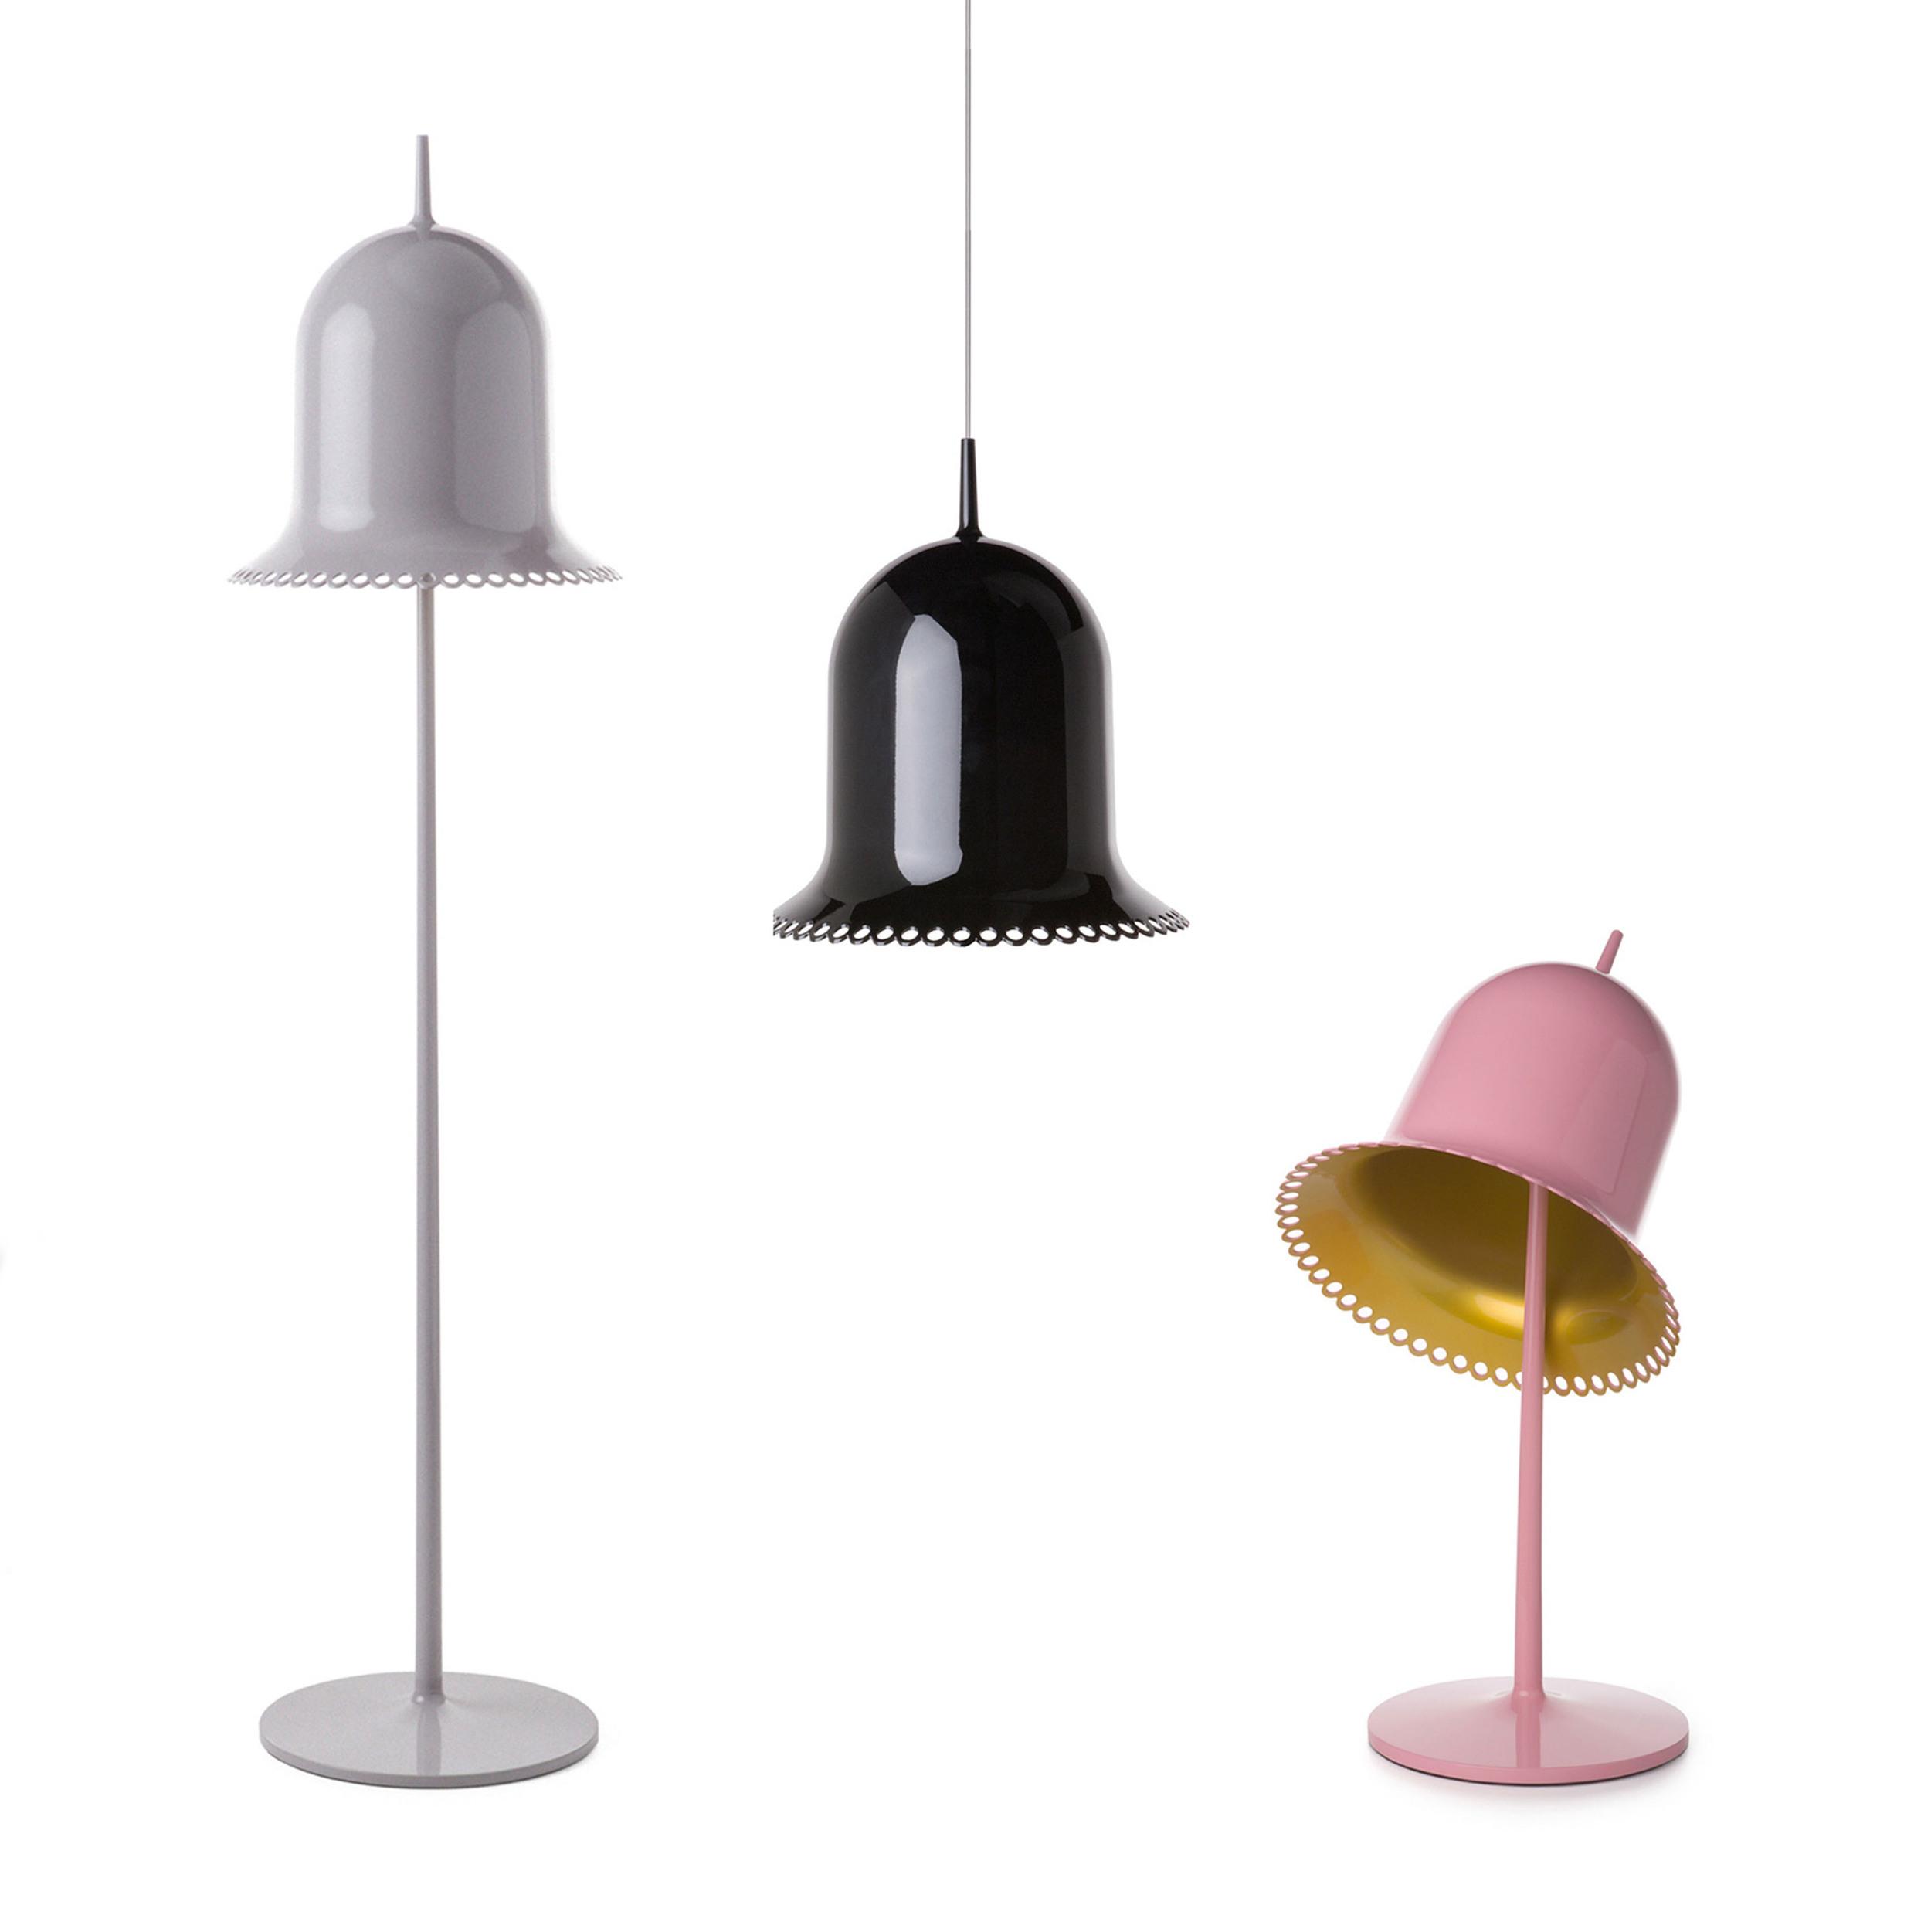 La lámpara Lolita, primer éxito de diseño de Nika Zupanc